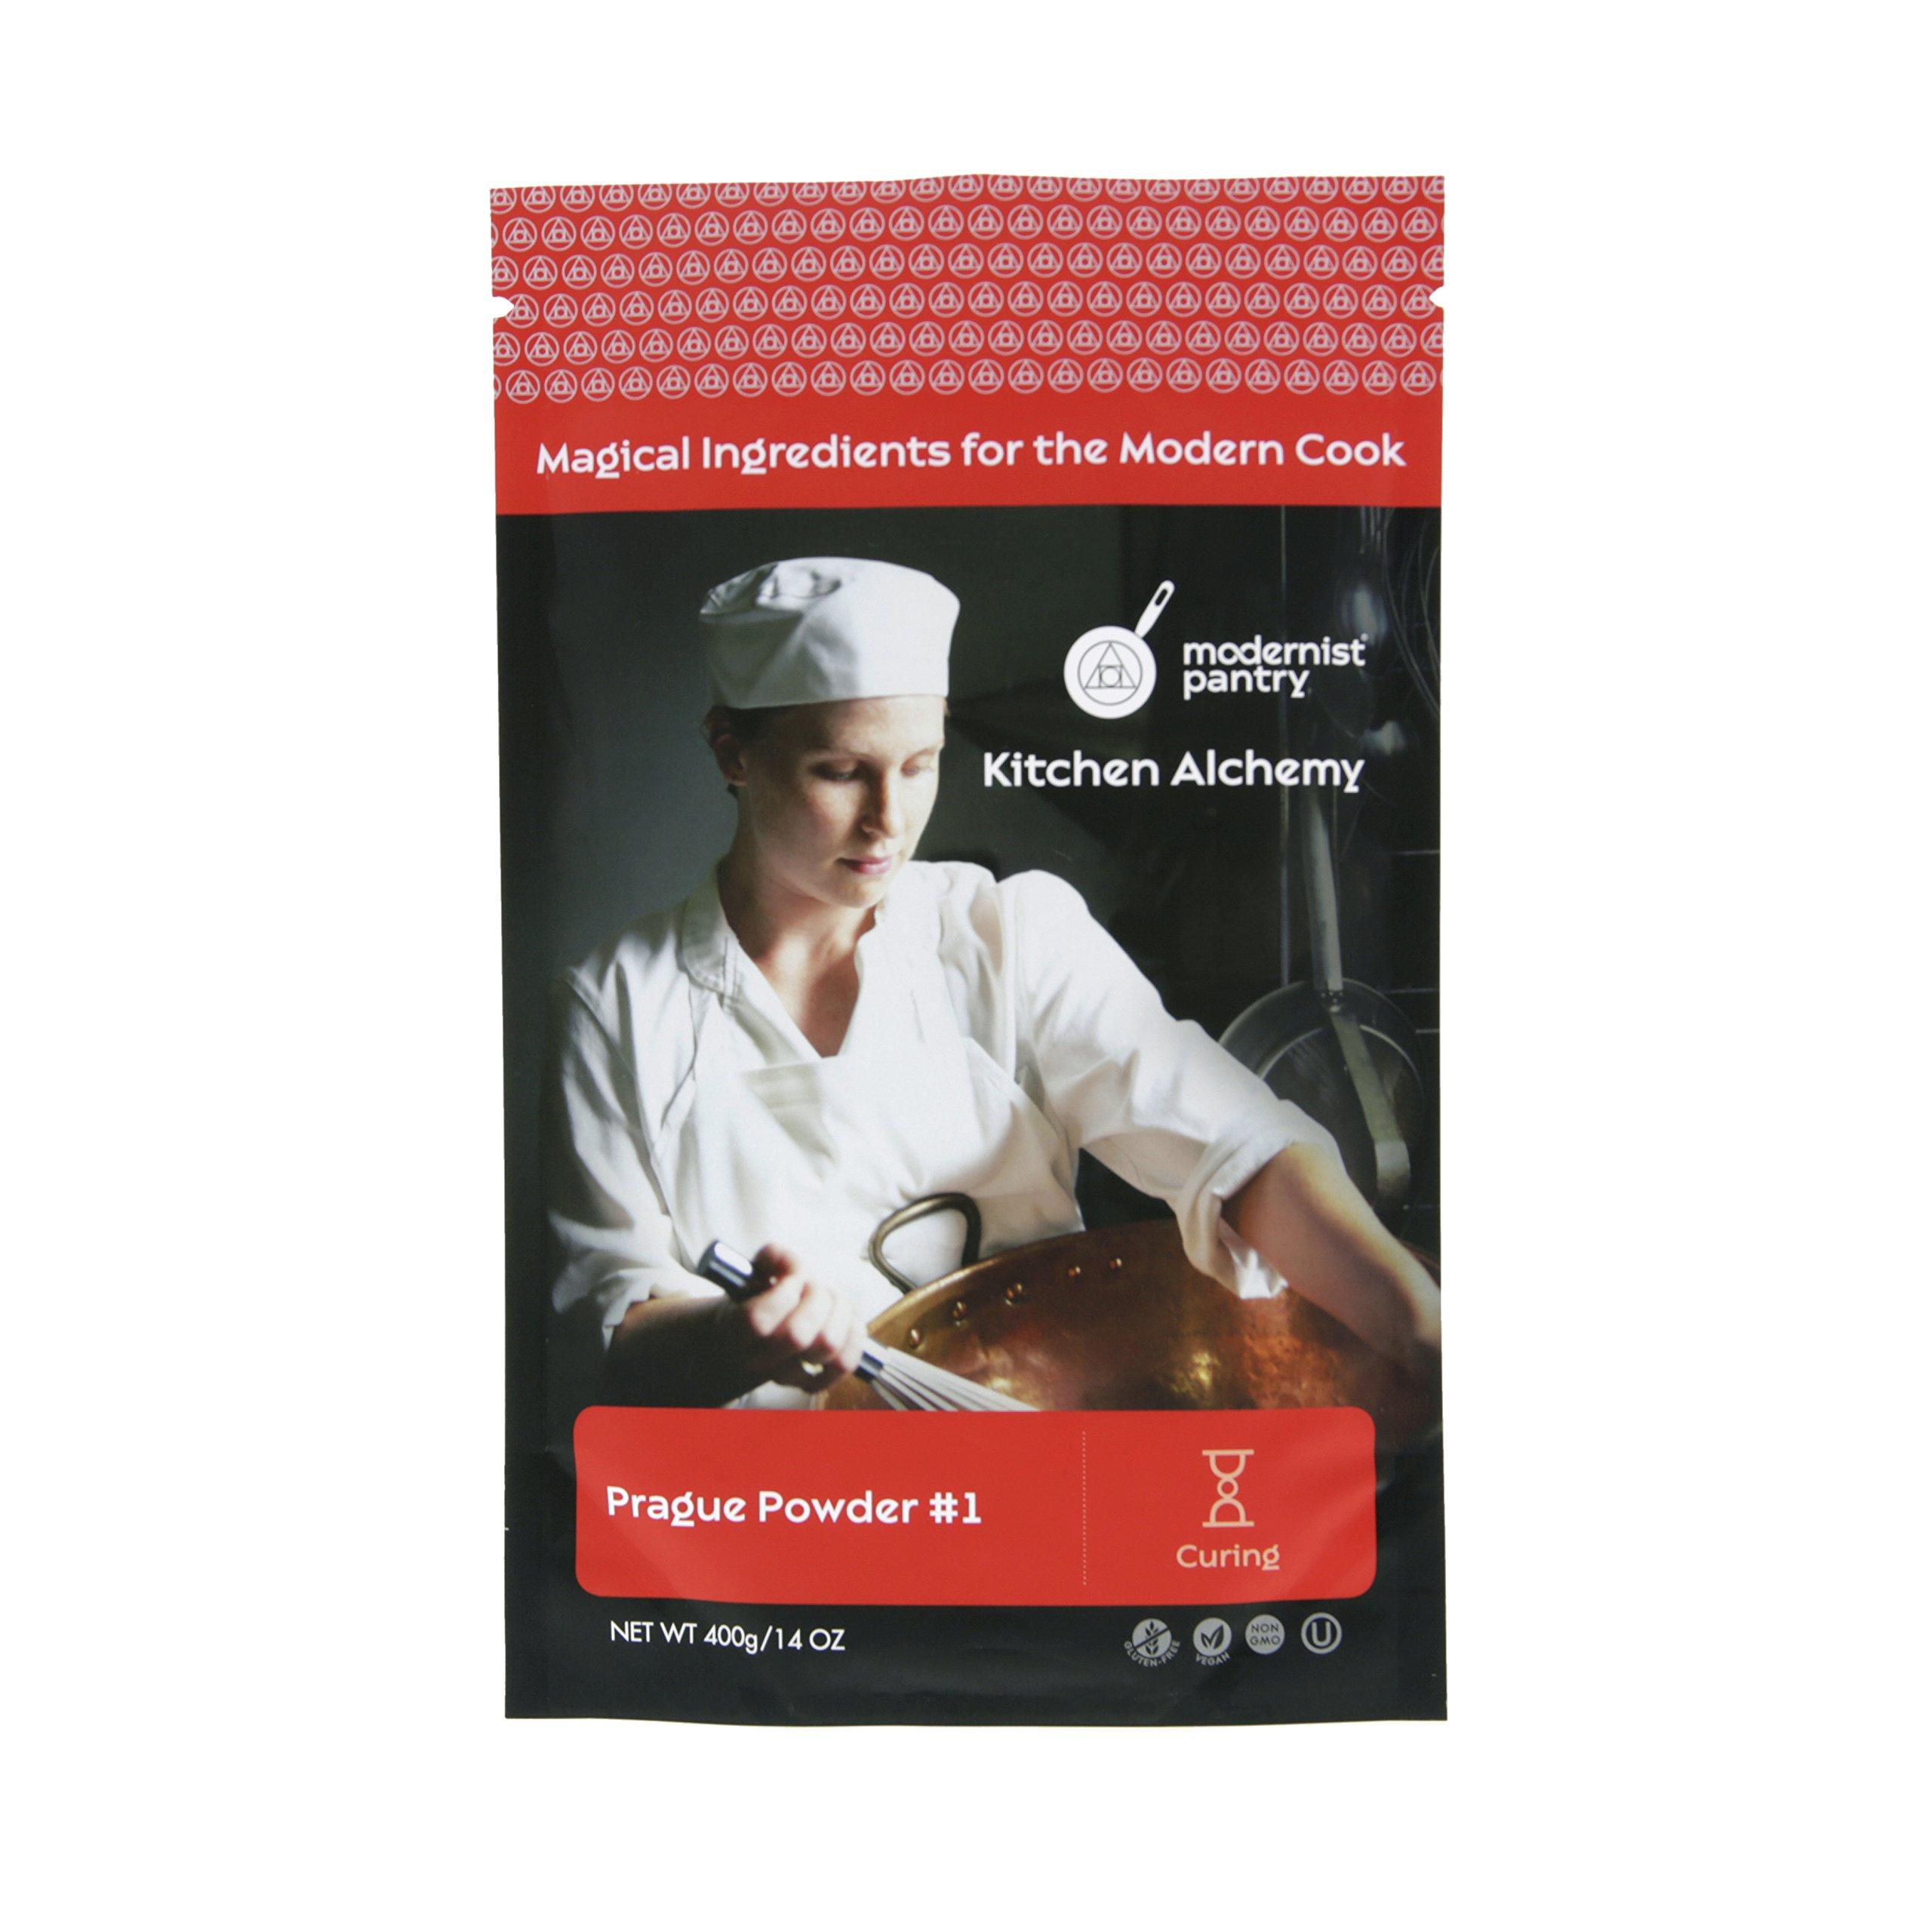 Pure Prague Powder #1 [aka Insta Cure #1, DQ Pink Curing Salt, Sel Rose] ⊘ Non-GMO ❤ Gluten-Free ✡ OU Kosher Certified - 400g/14oz